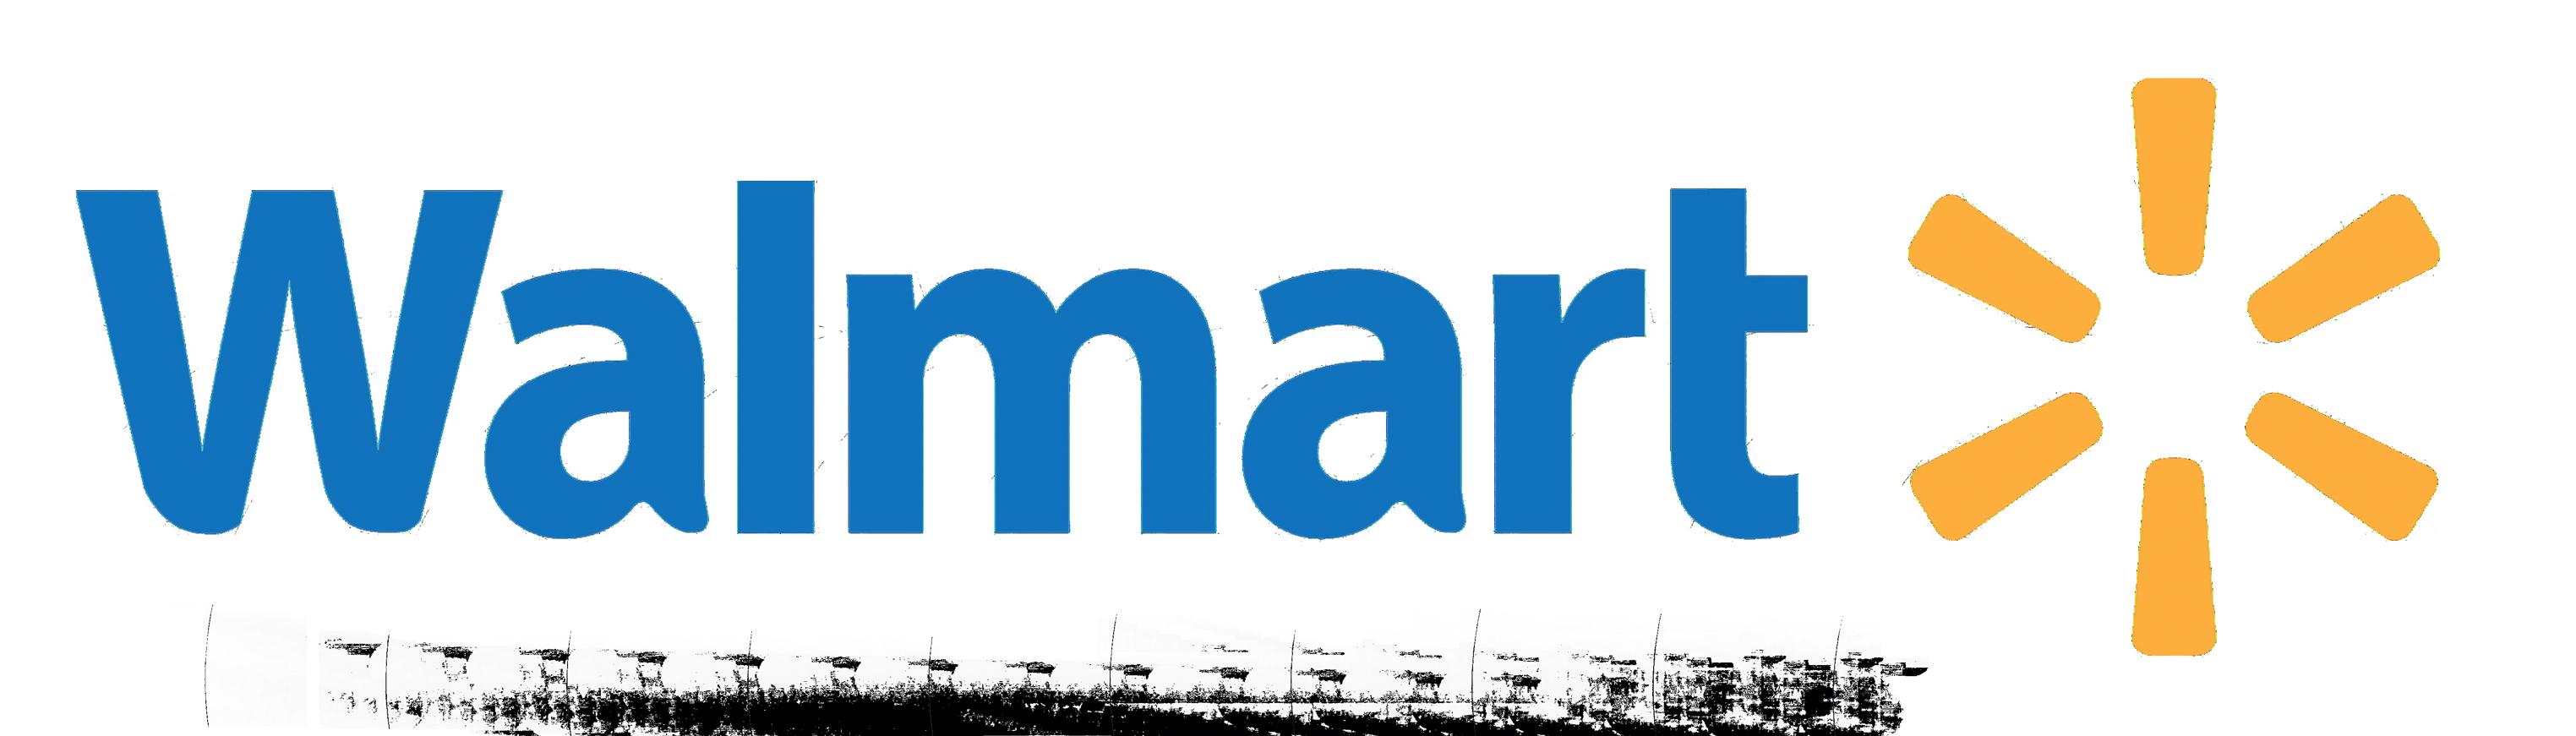 Download Walmart Logo PNG Image for Free